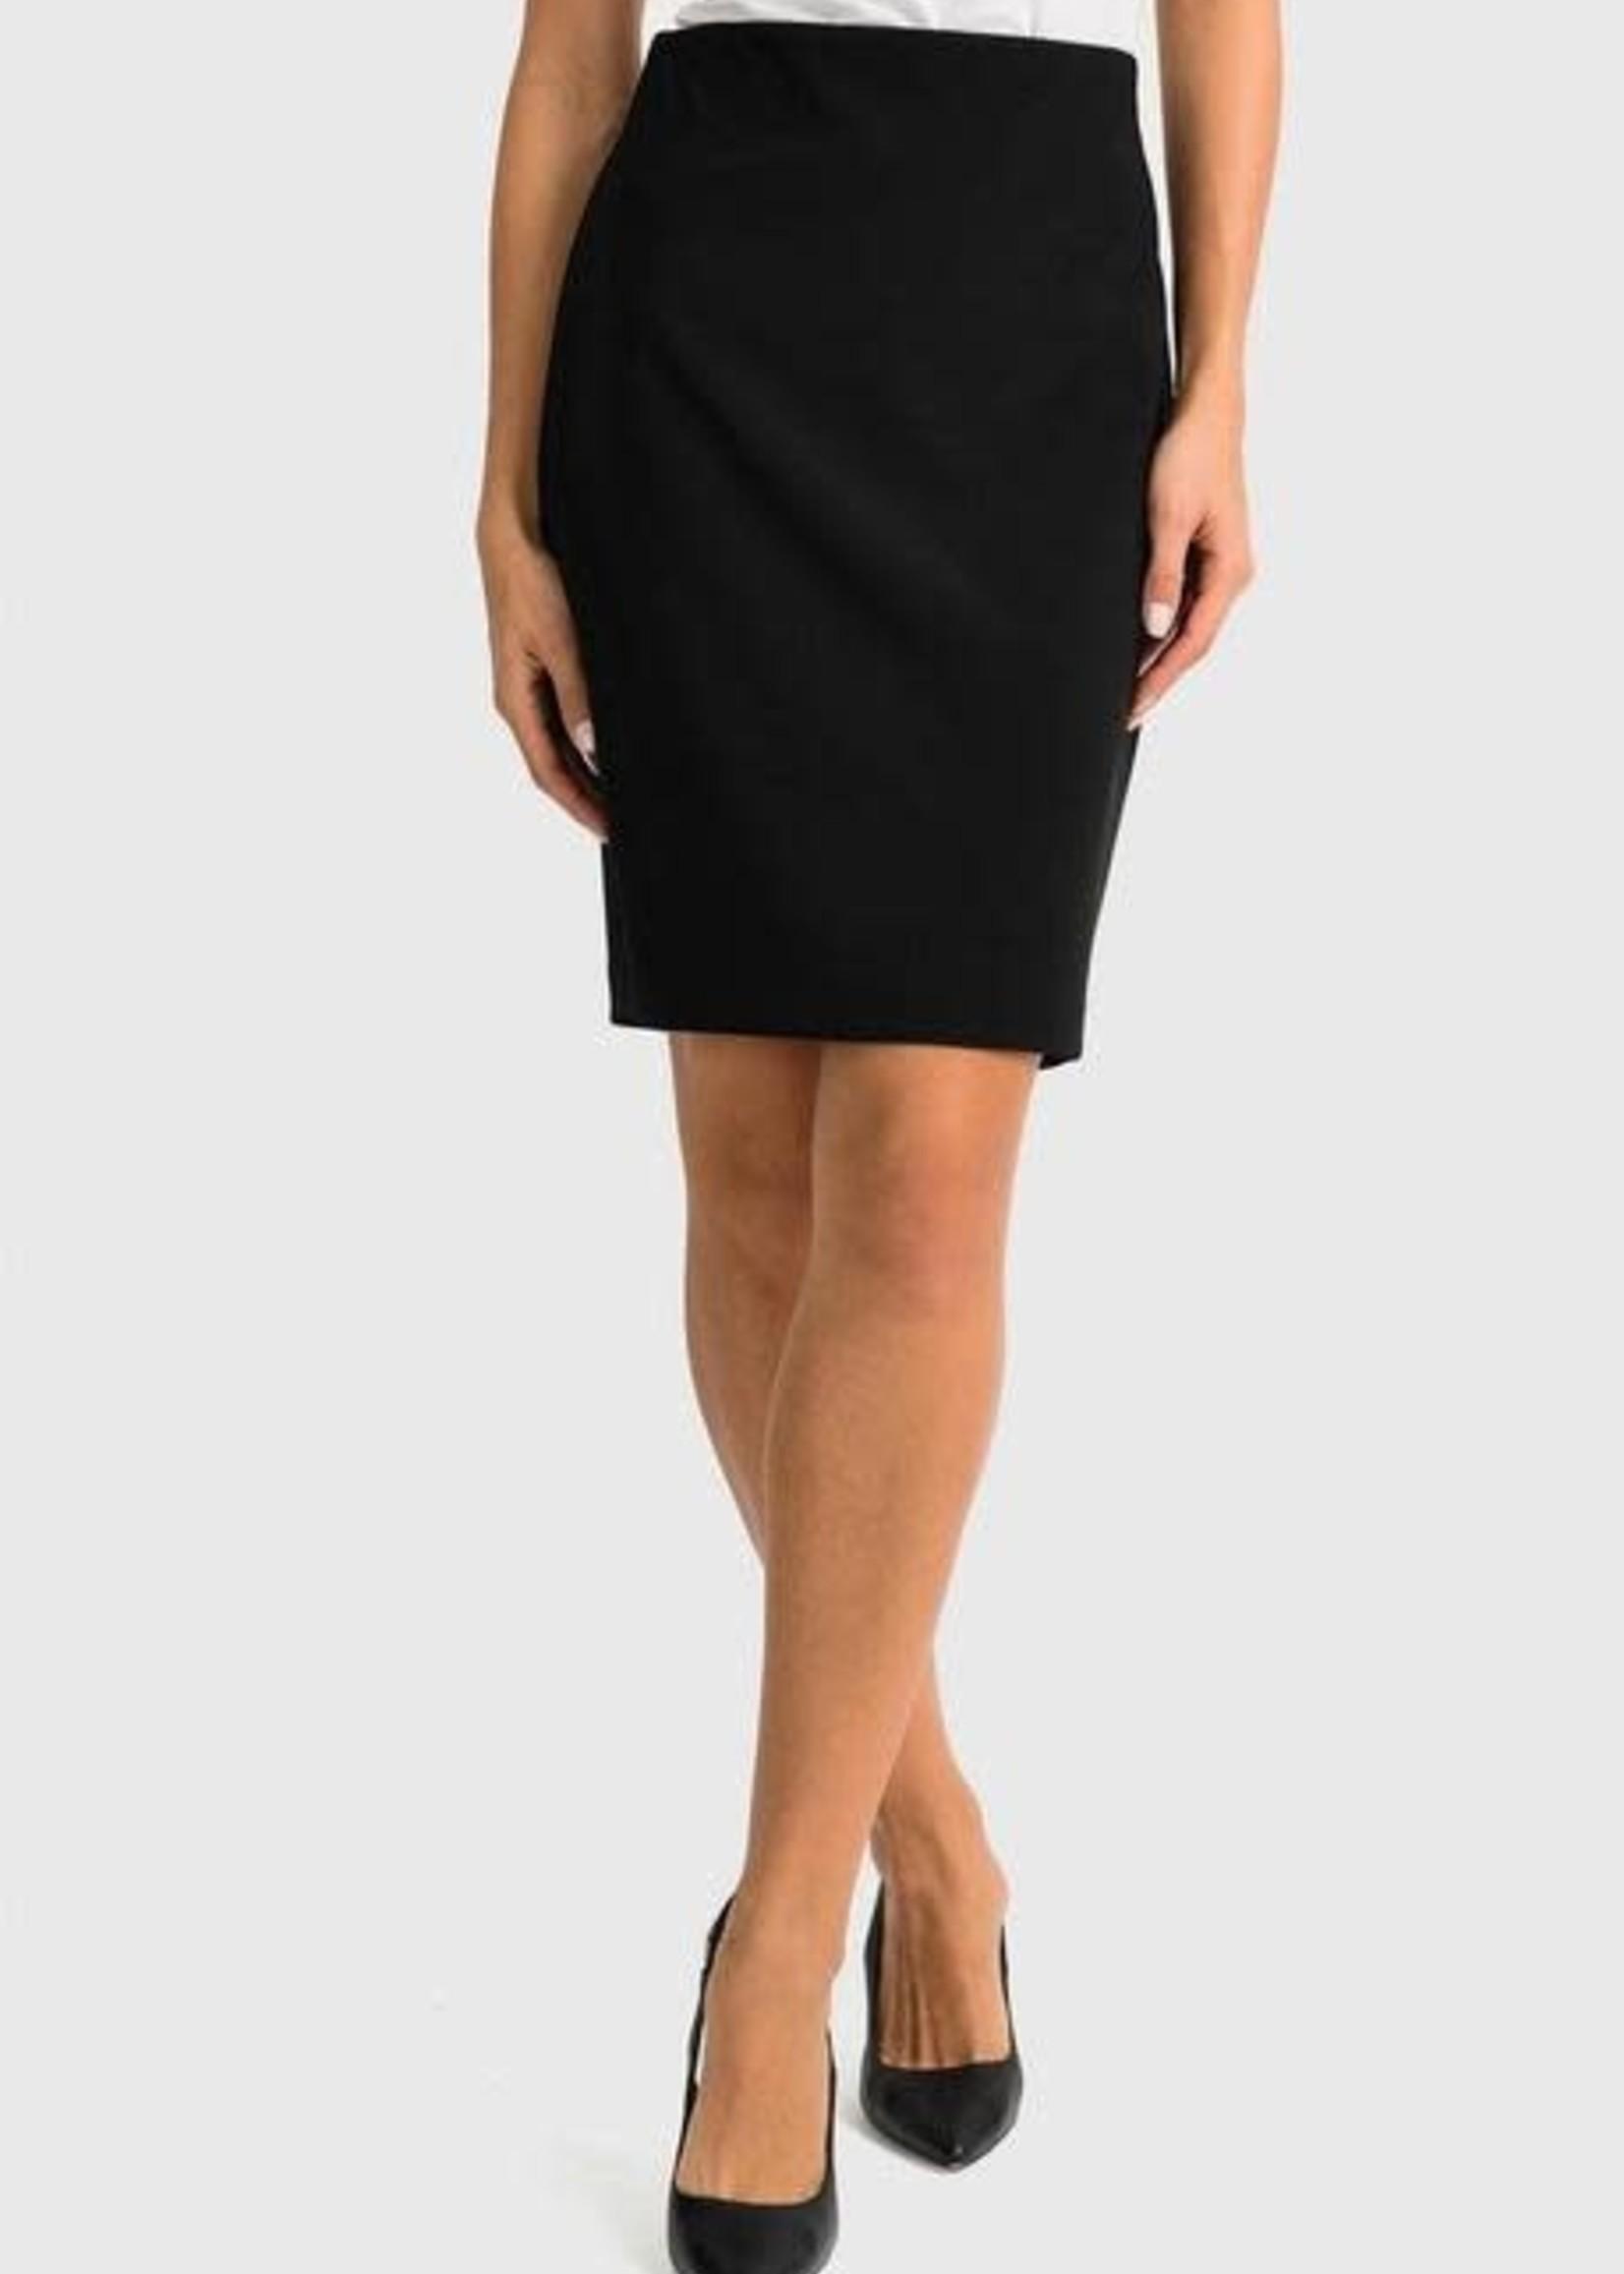 Joseph Ribkoff Joseph Ribkoff Knee Length Skirt